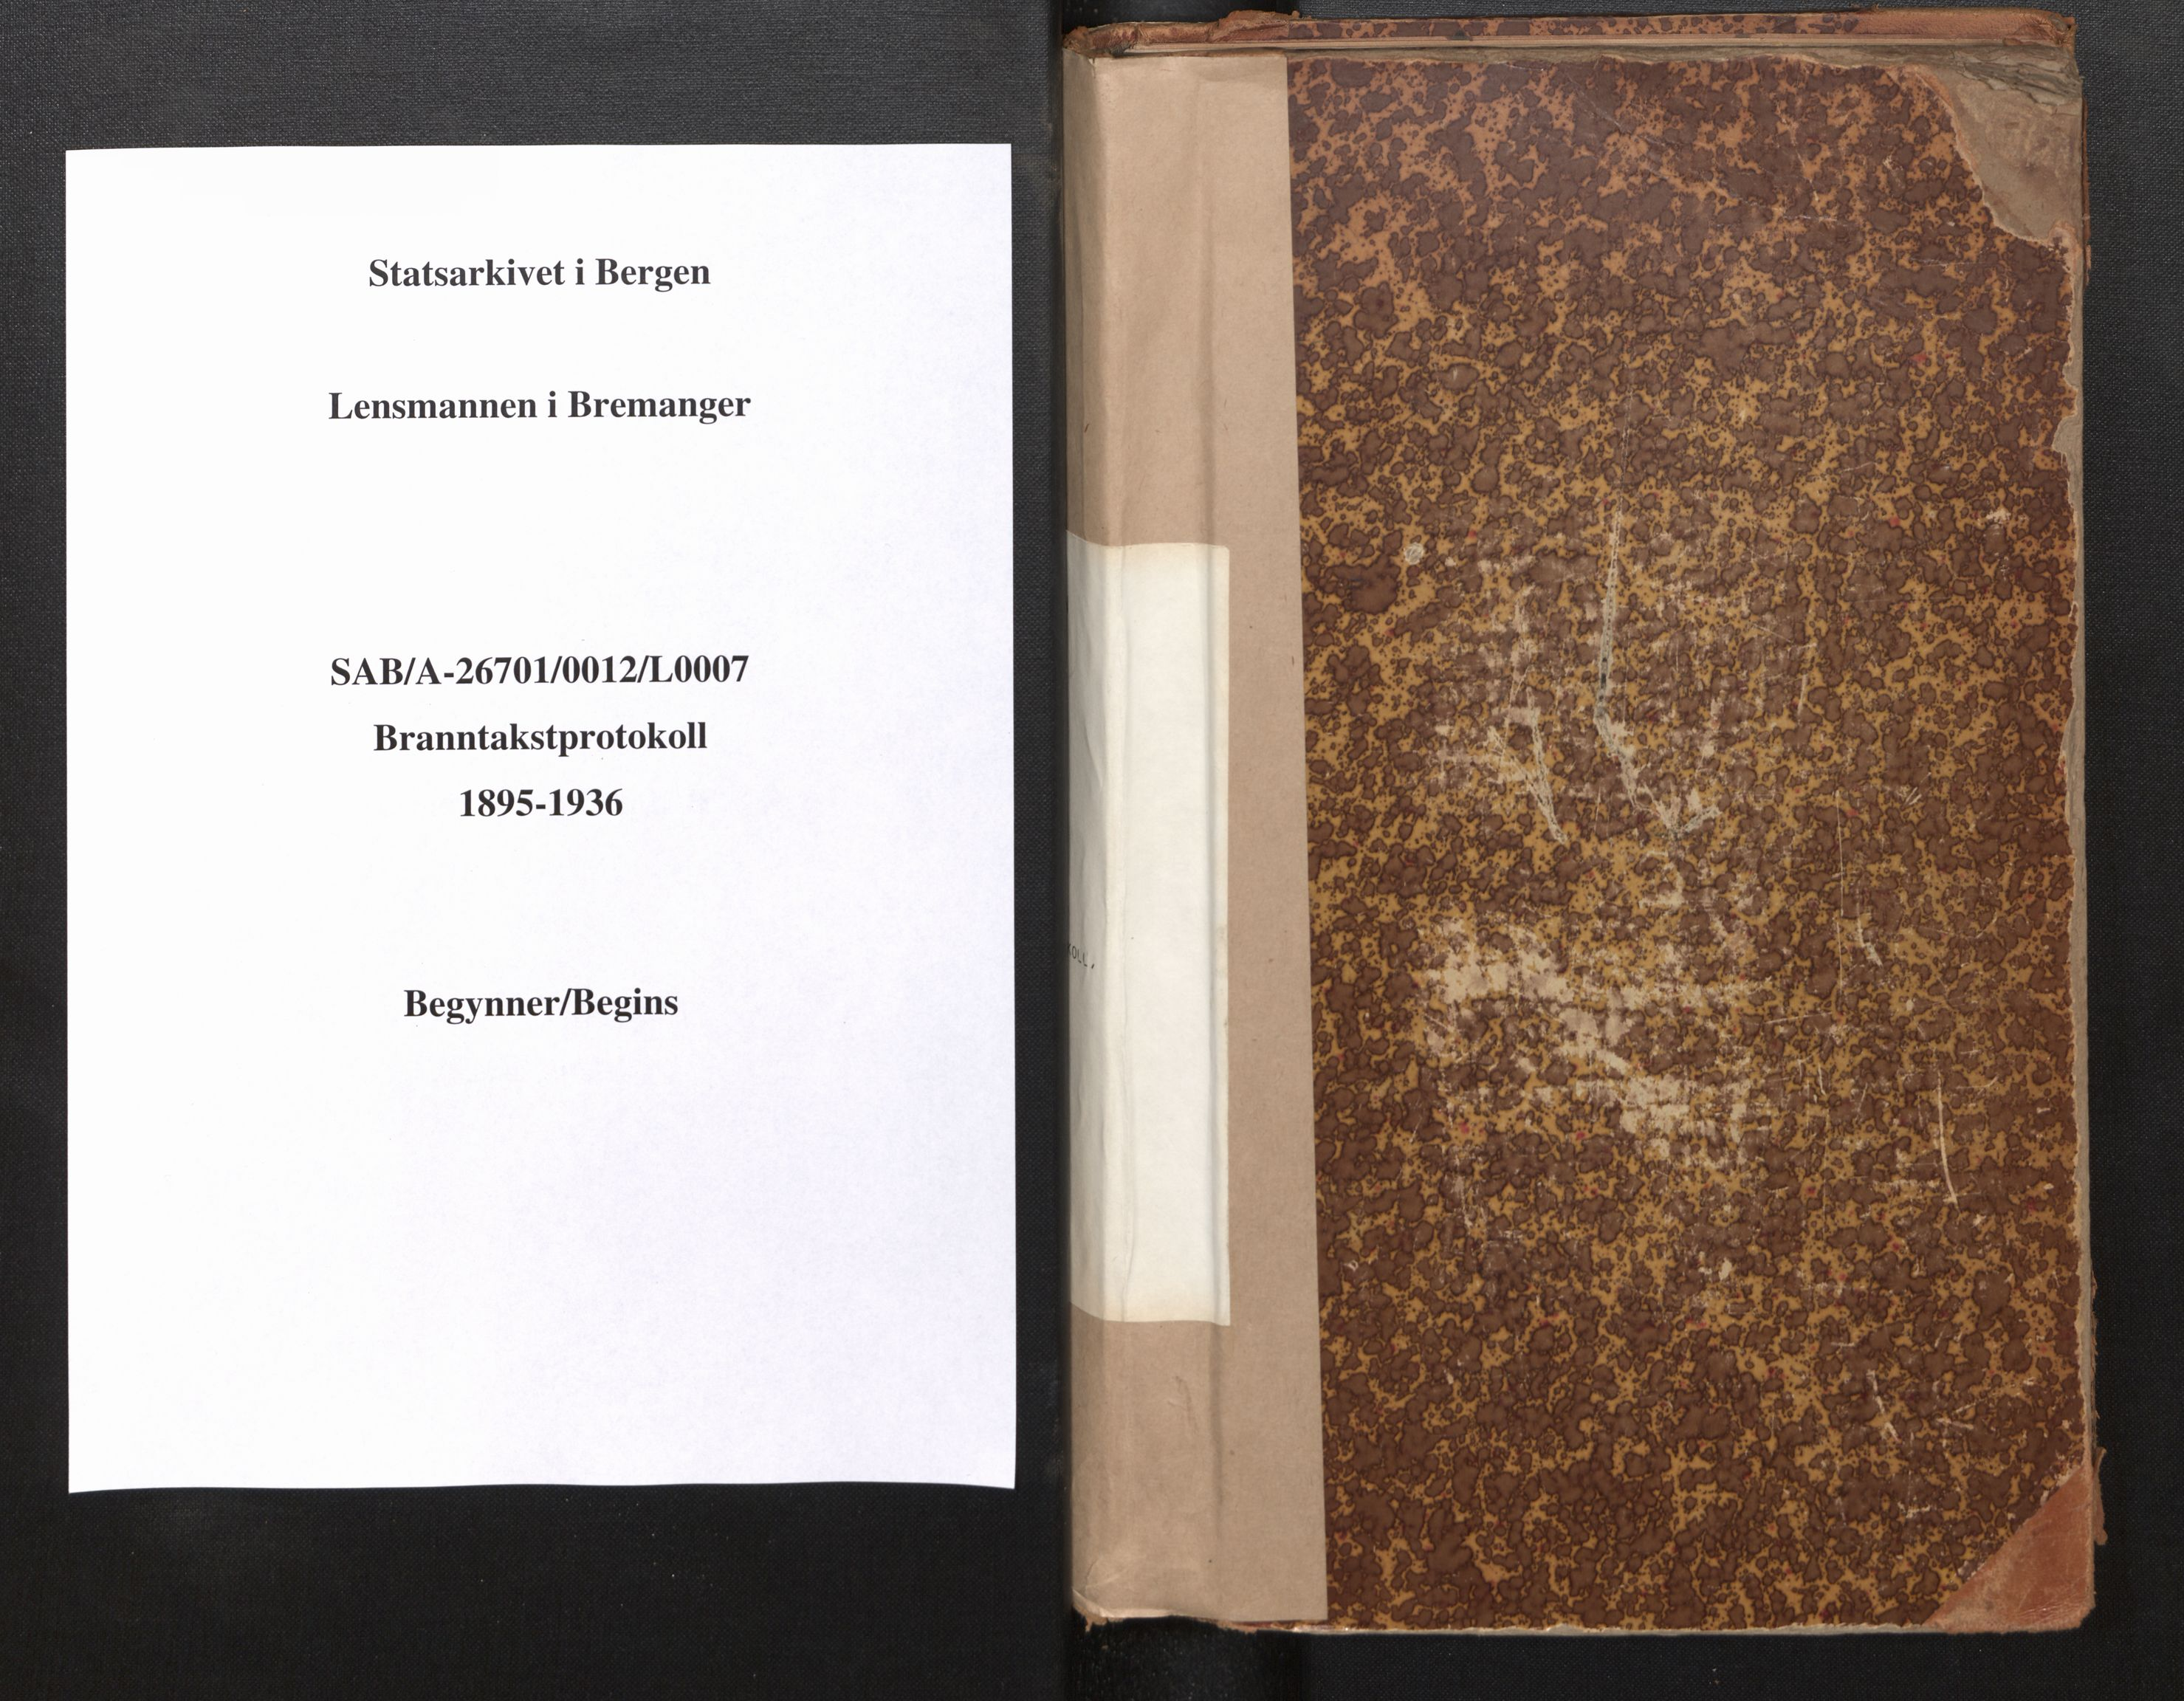 SAB, Lensmannen i Bremanger, 0012/L0007: Branntakstprotokoll, skjematakst, 1895-1936